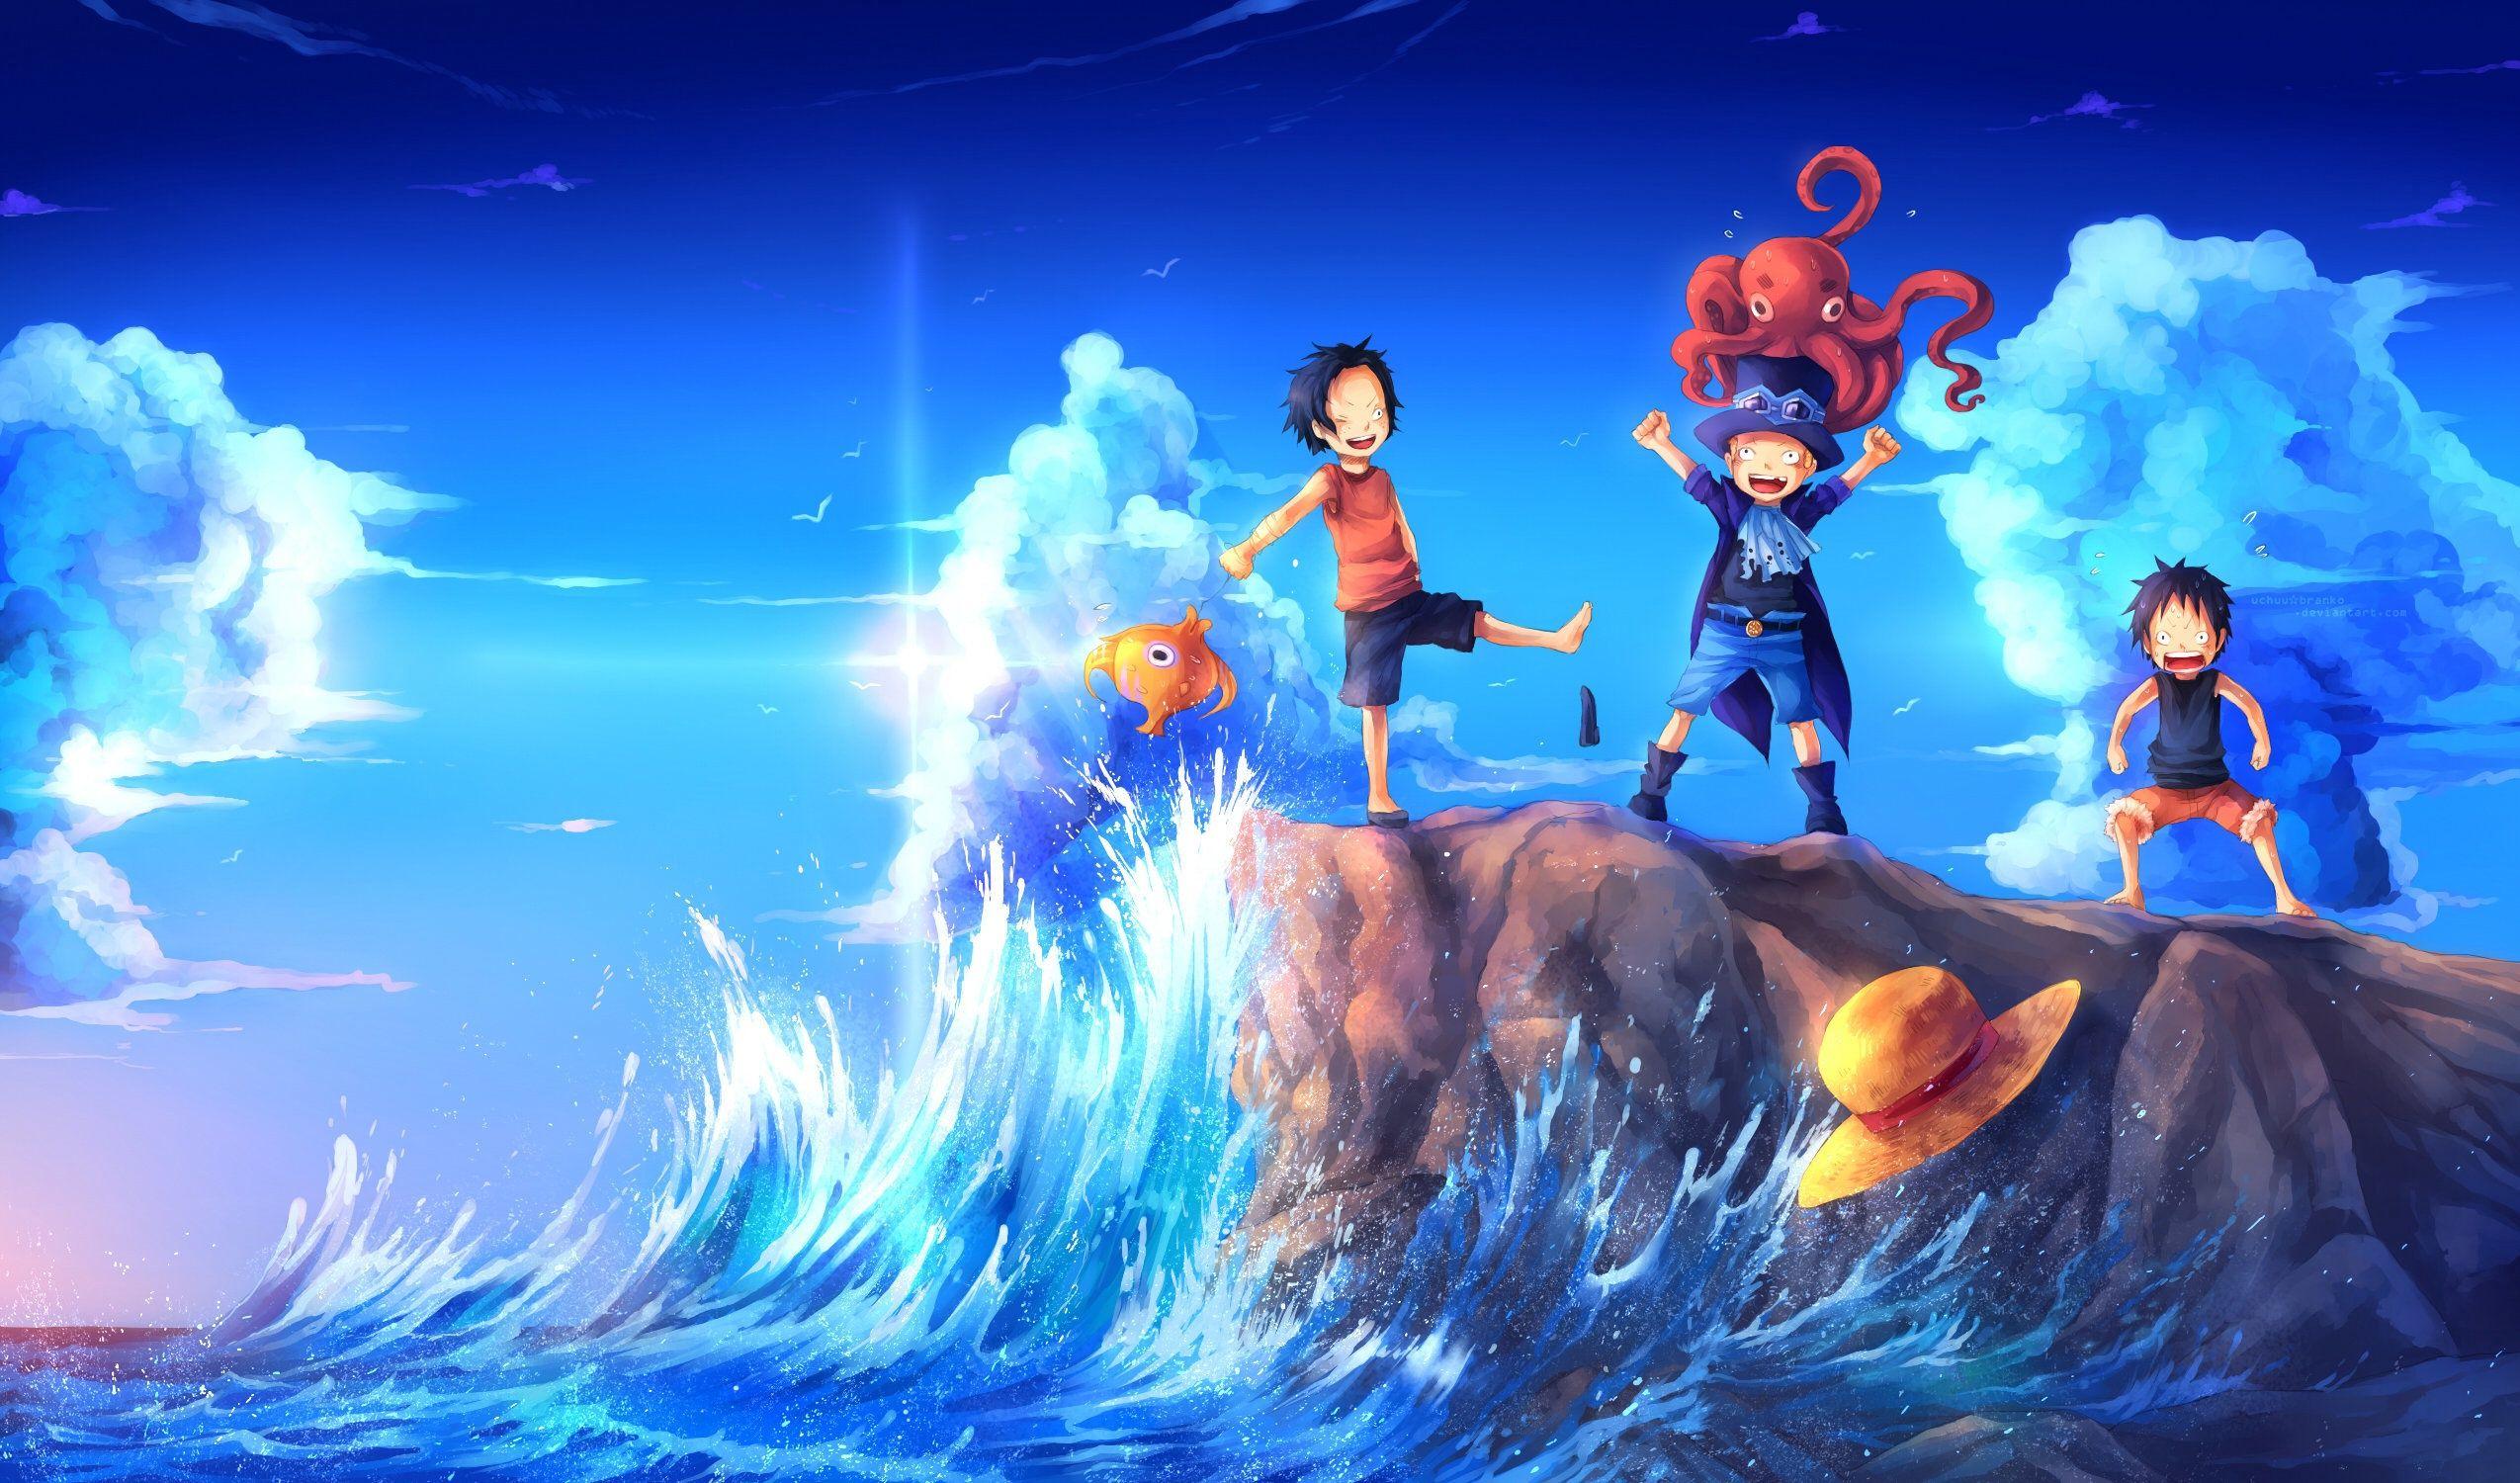 Luffy Ace And Sabo 2 Fonds D Ecran Arrieres Plan 2549x1500 Id 605588 Ace One Piece Fond D Ecran Dessin Fond D Ecran Ordinateur